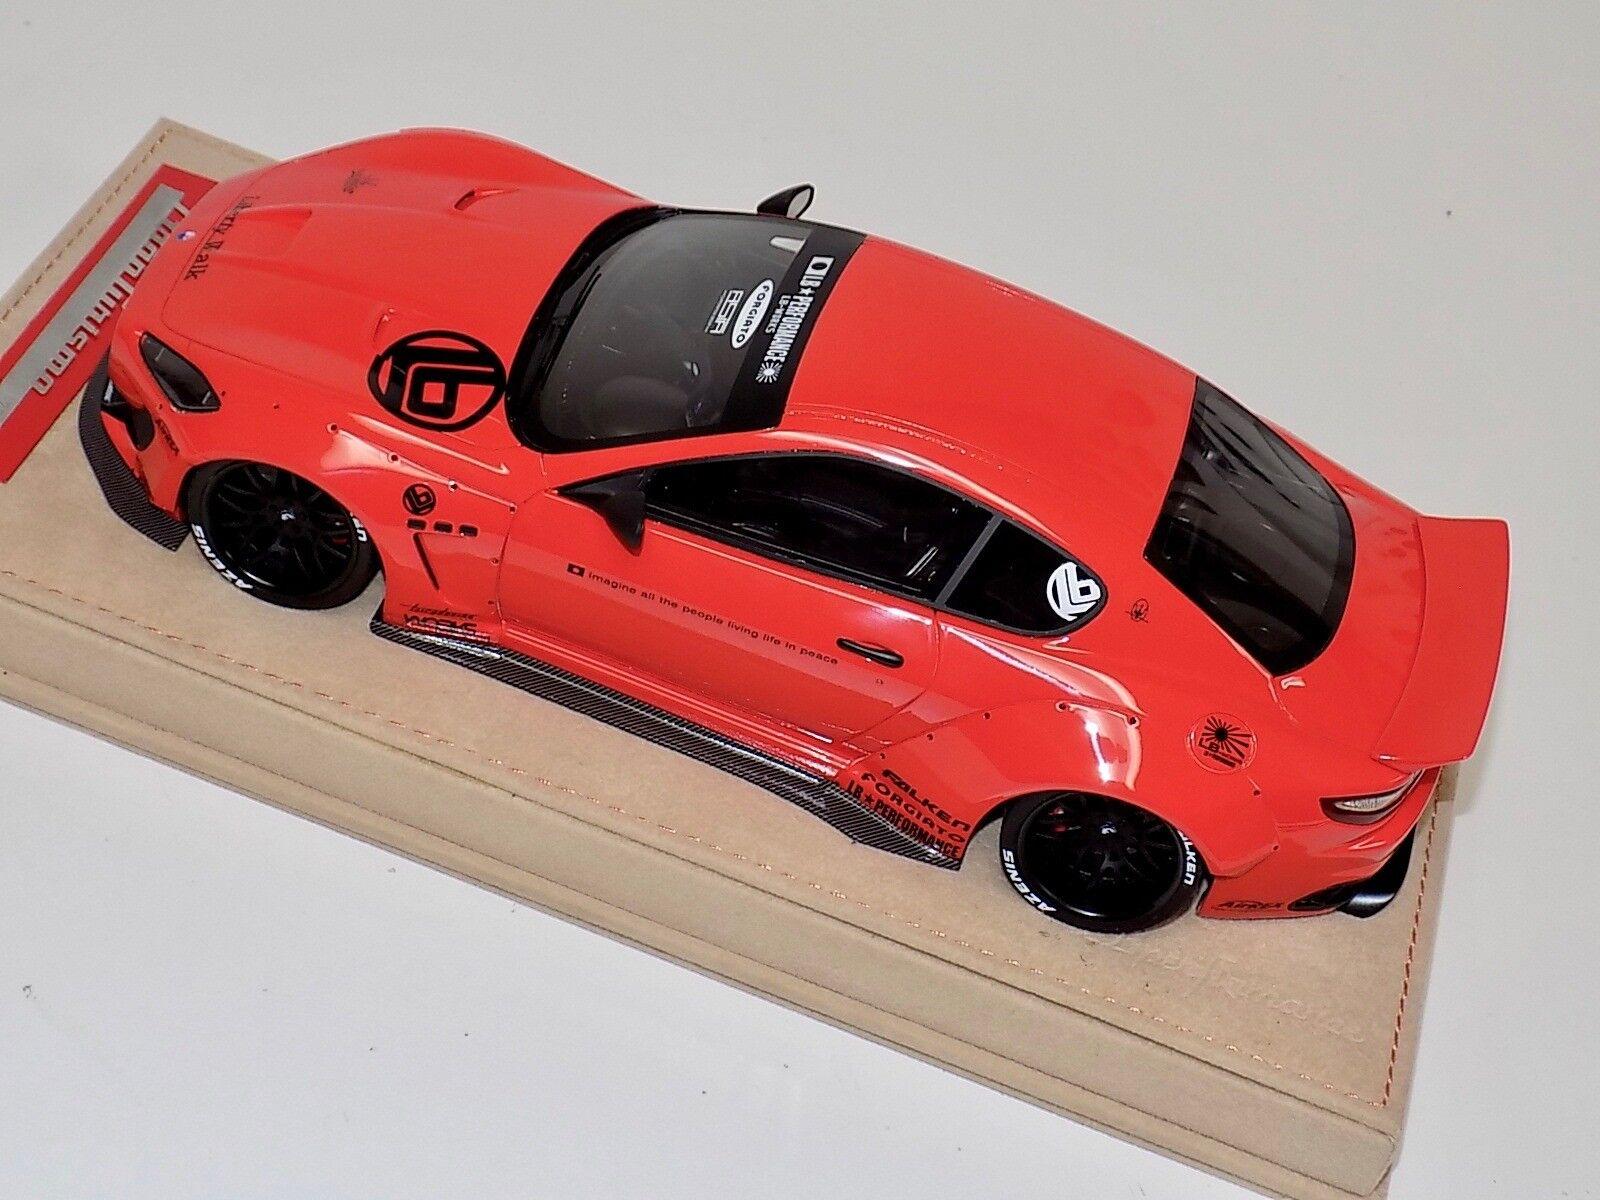 1/18 1/18 1/18 AB Models Maserati Granturismo Liberty walk rosso with Decals Alcantara Base 6629bc